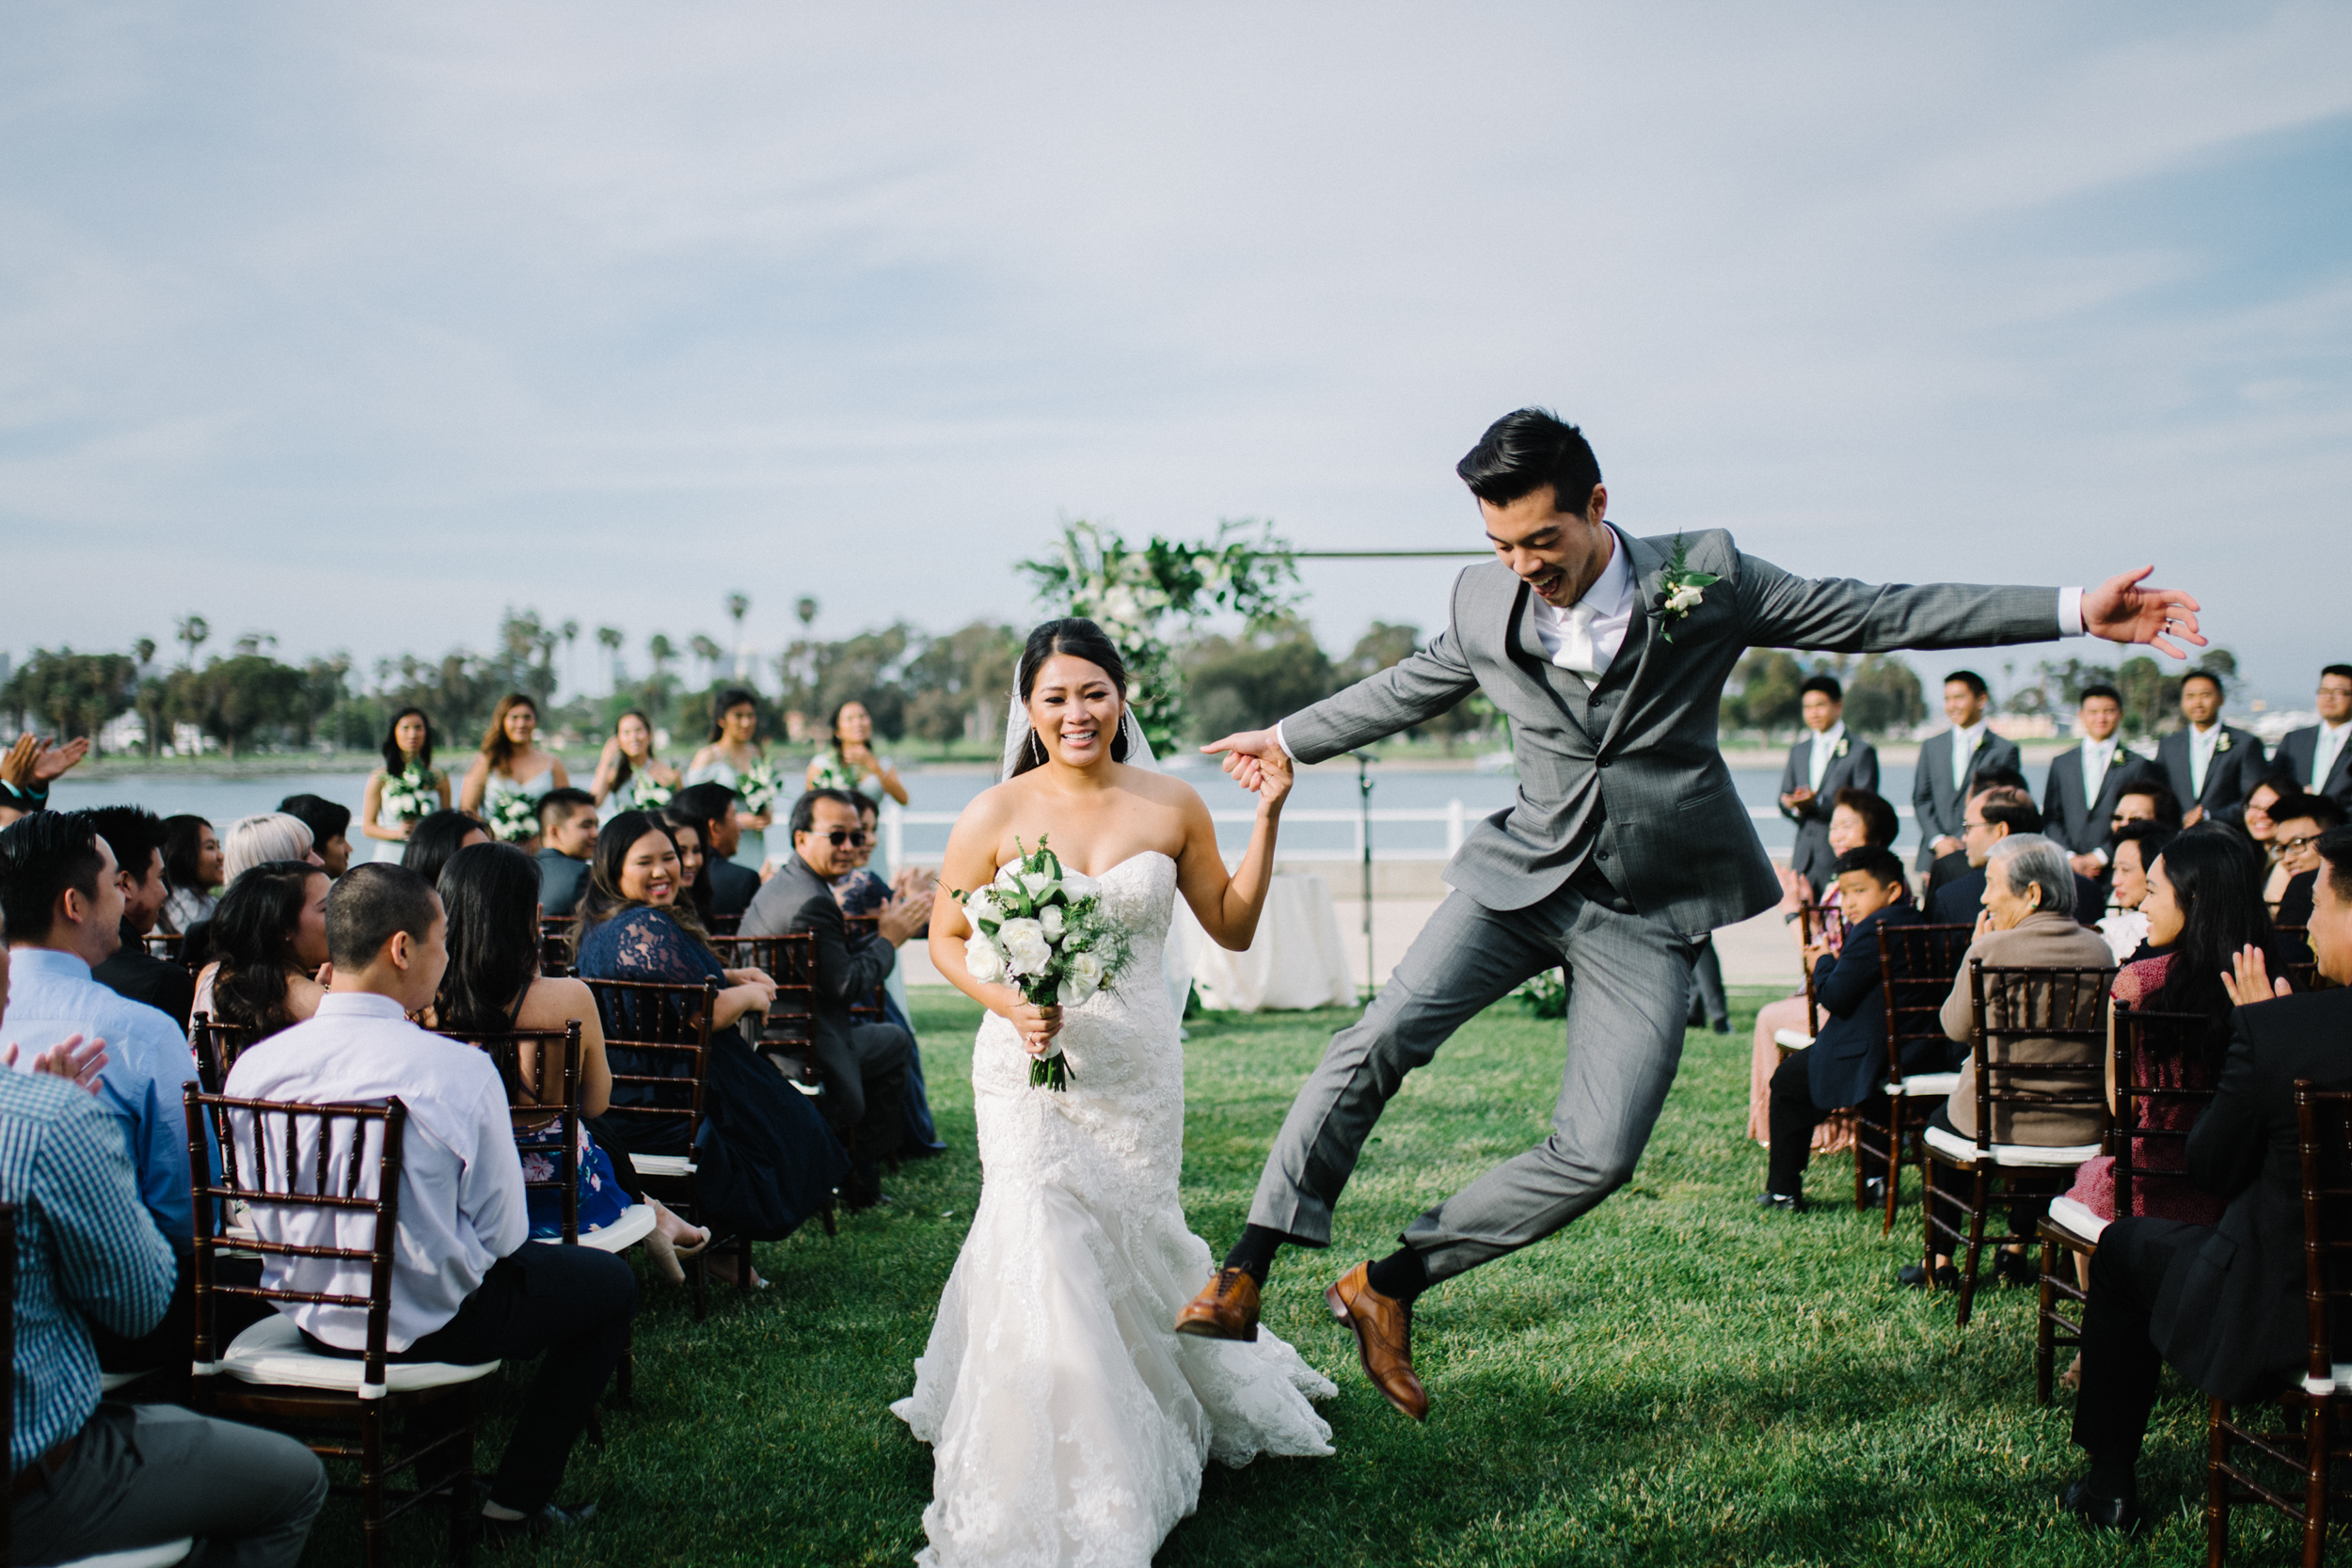 wedding_coronado_community_center-25.jpg